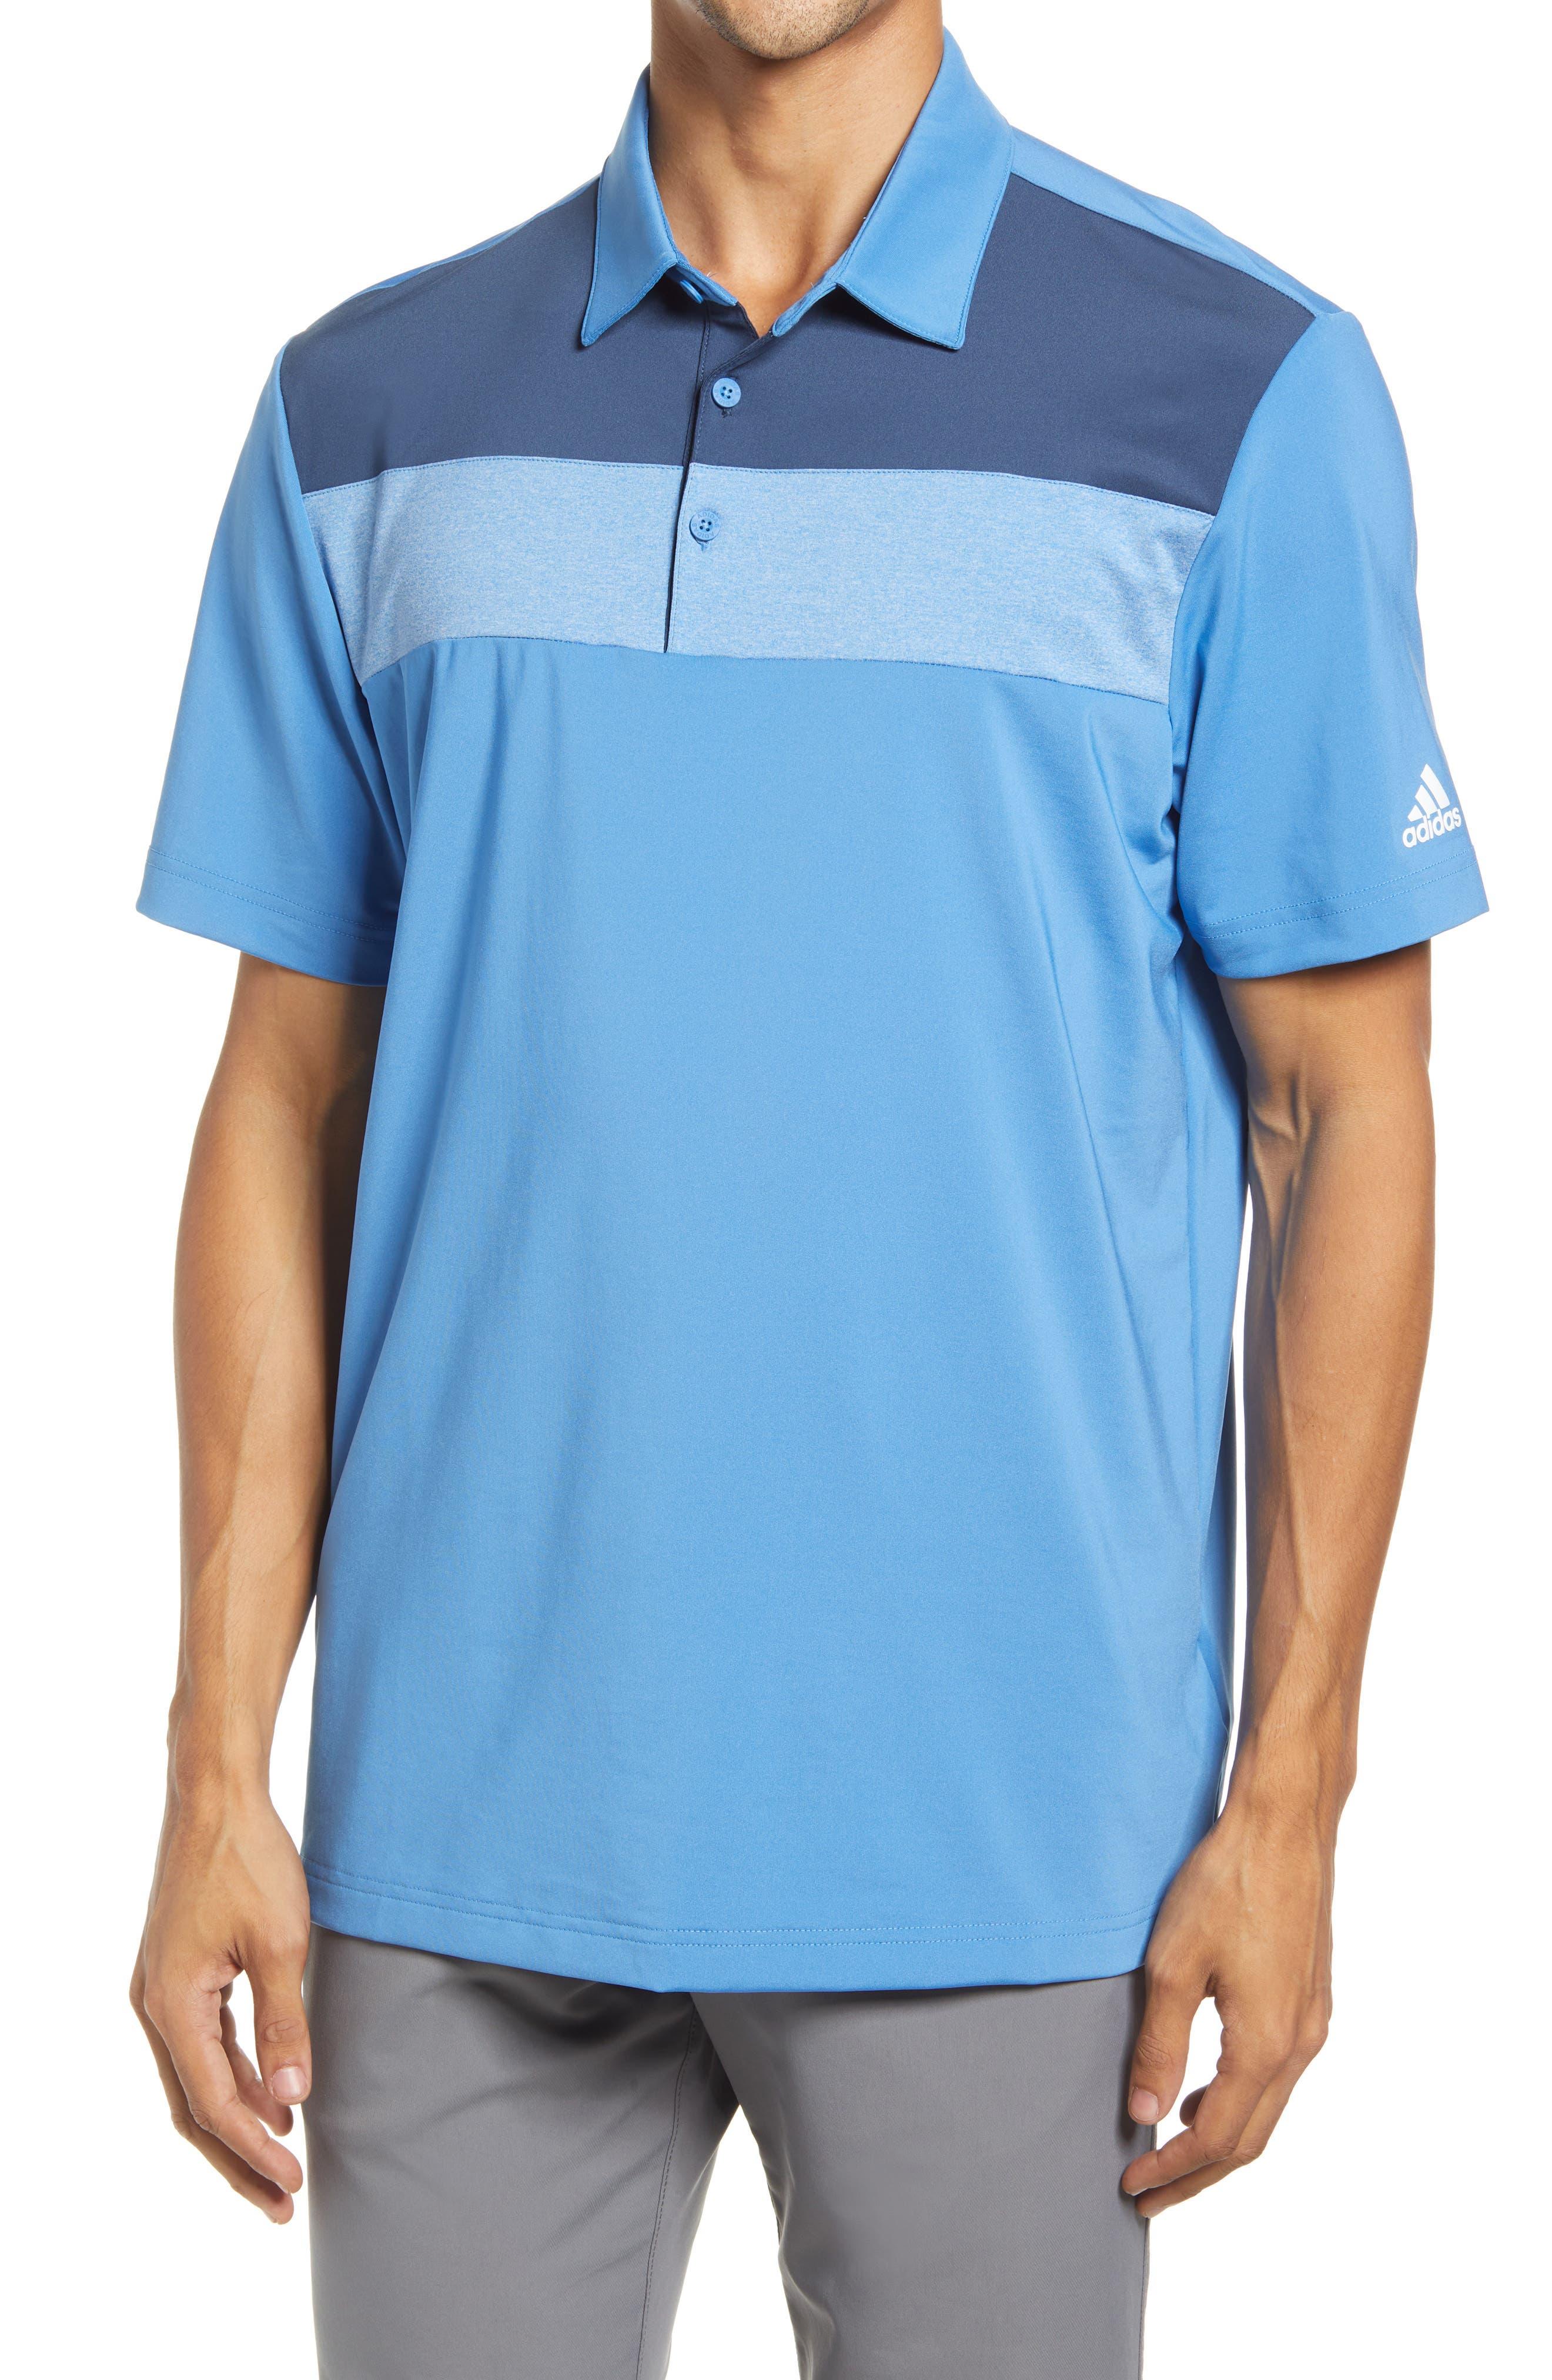 Men's Stretch Colorblock Polo Shirt